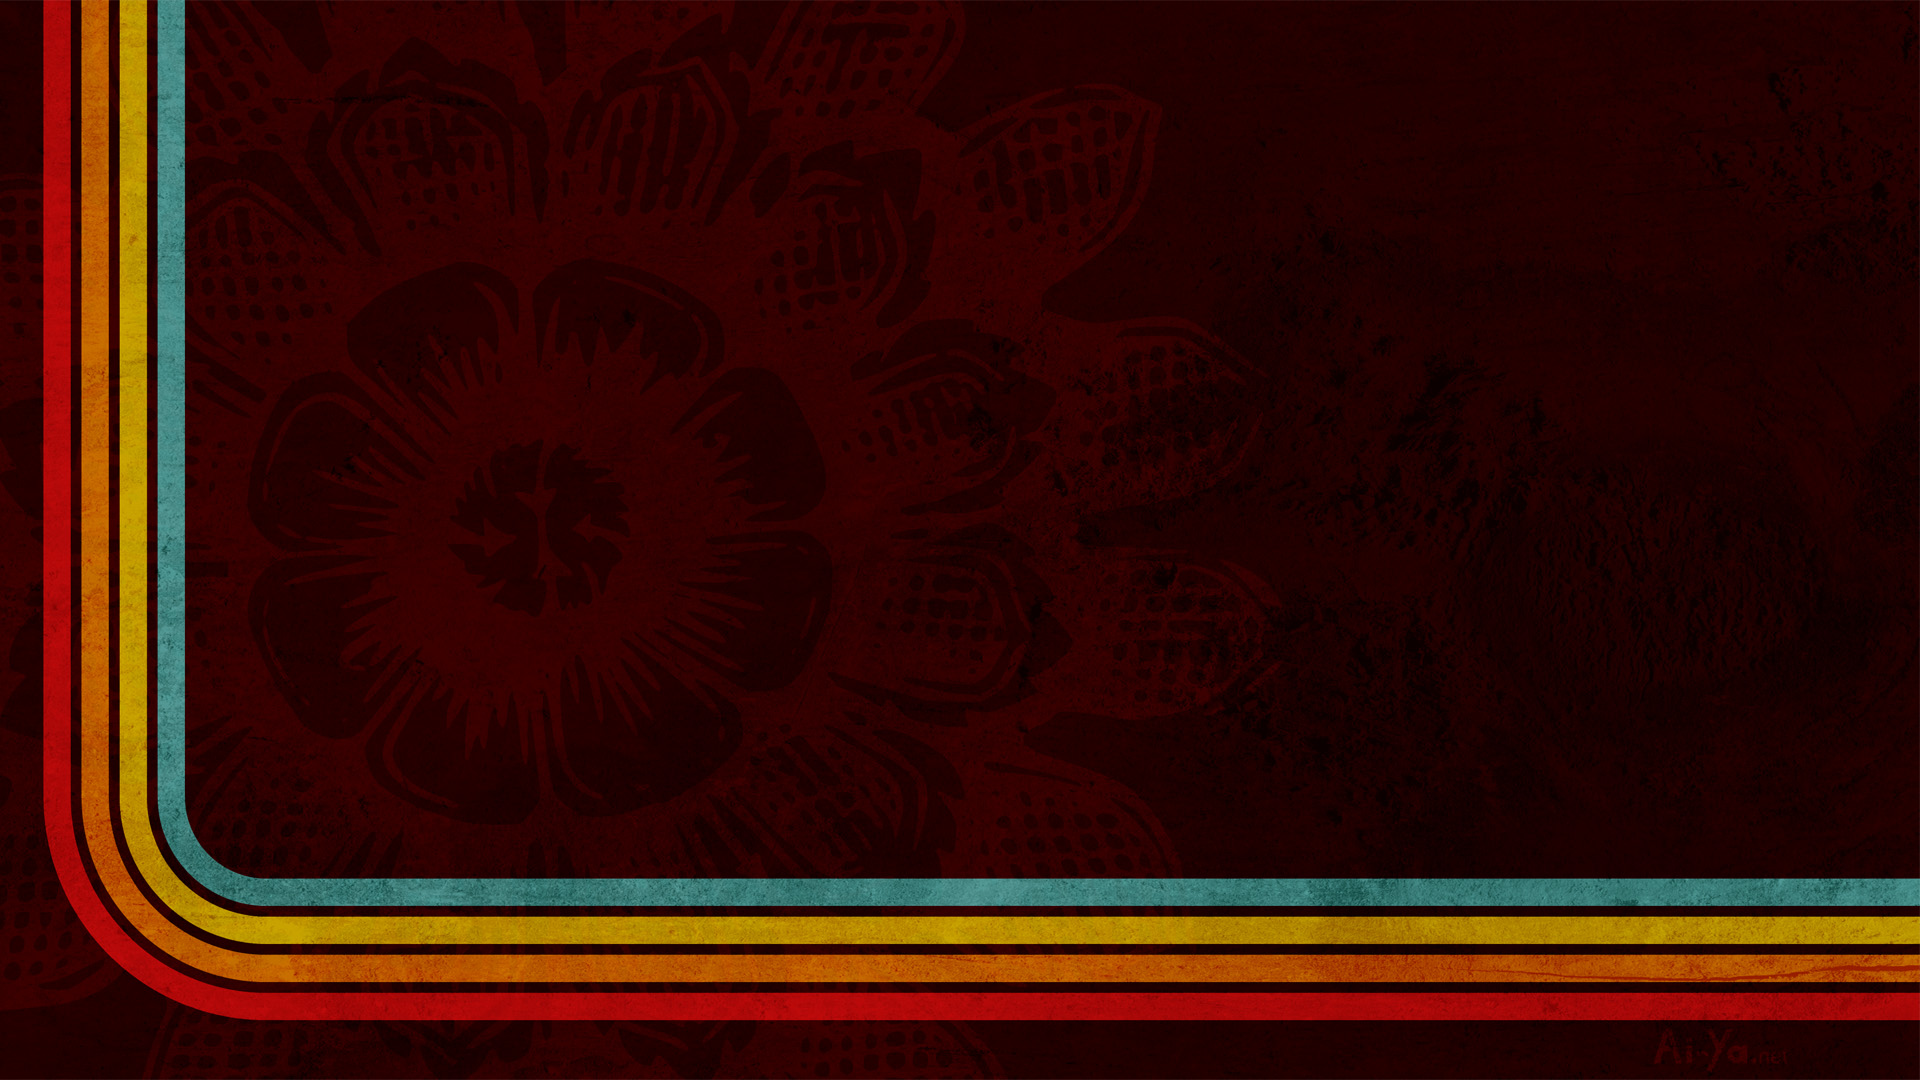 66 Retro Wallpaper For Desktop And Mobile 1920x1080